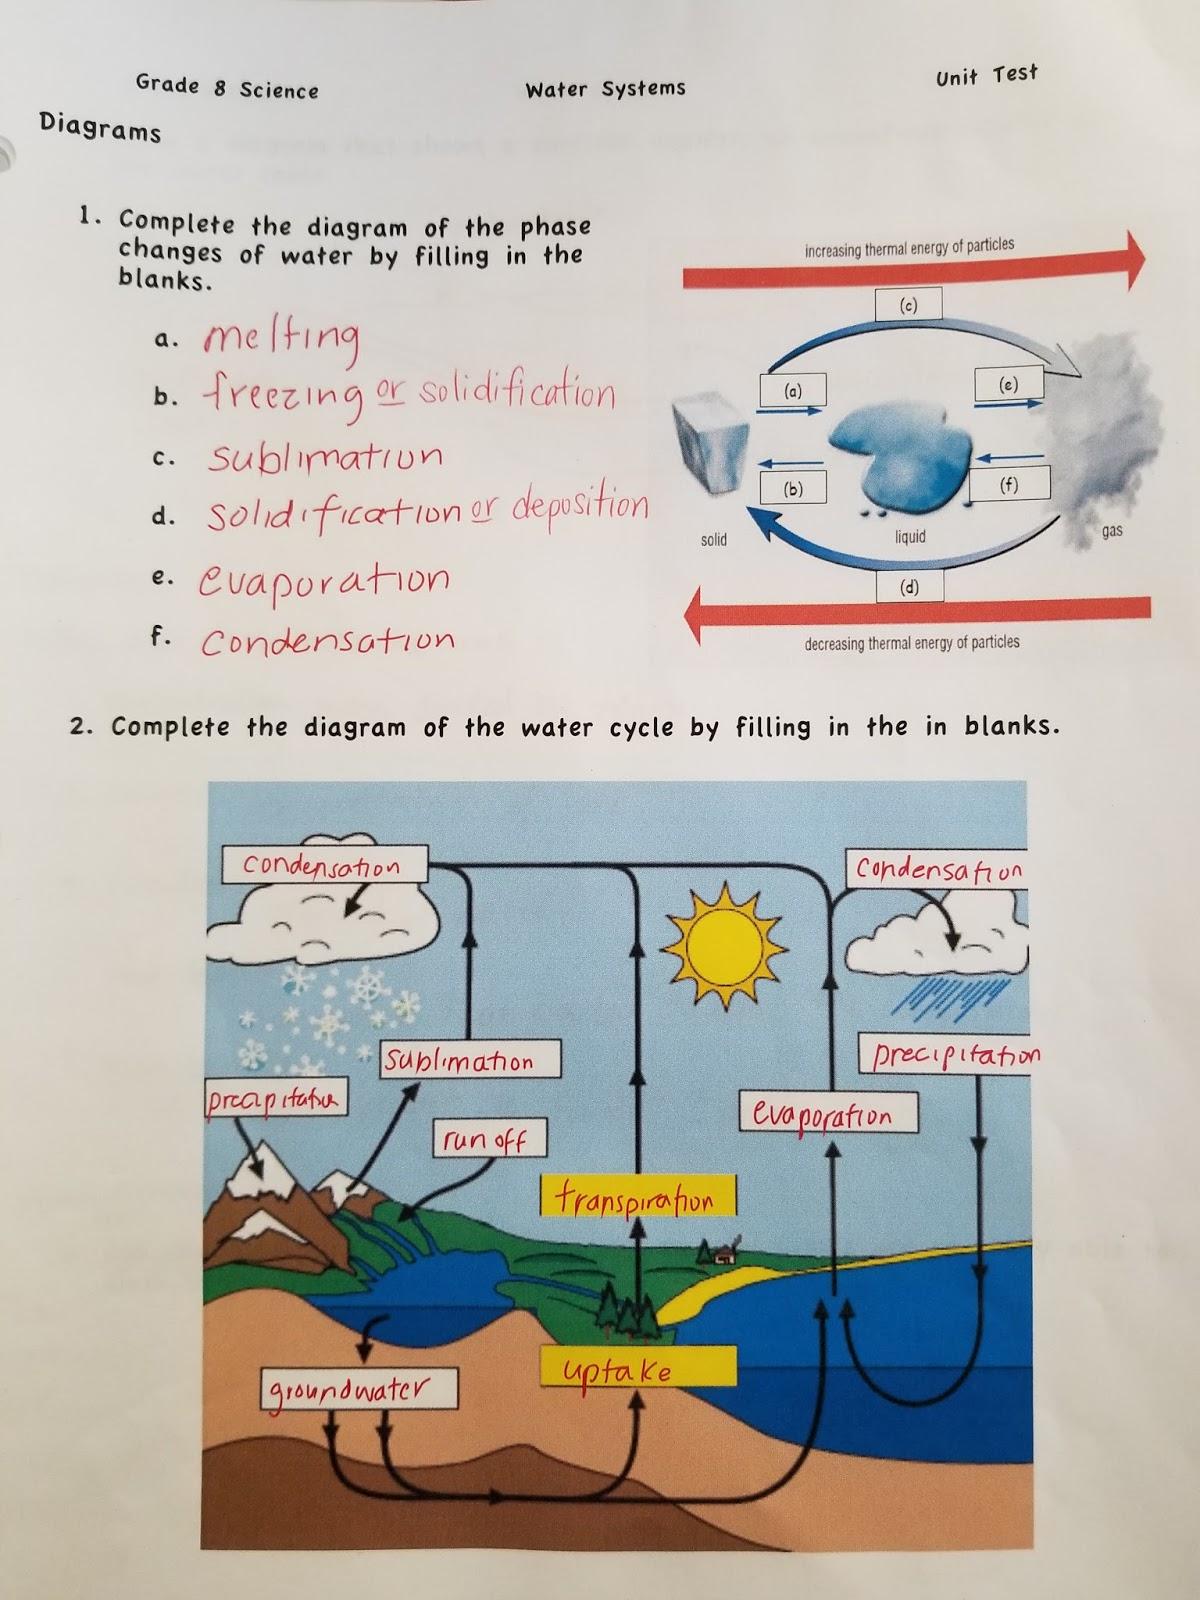 medium resolution of grade 8 science quiz on water systems on thursday may 3rd